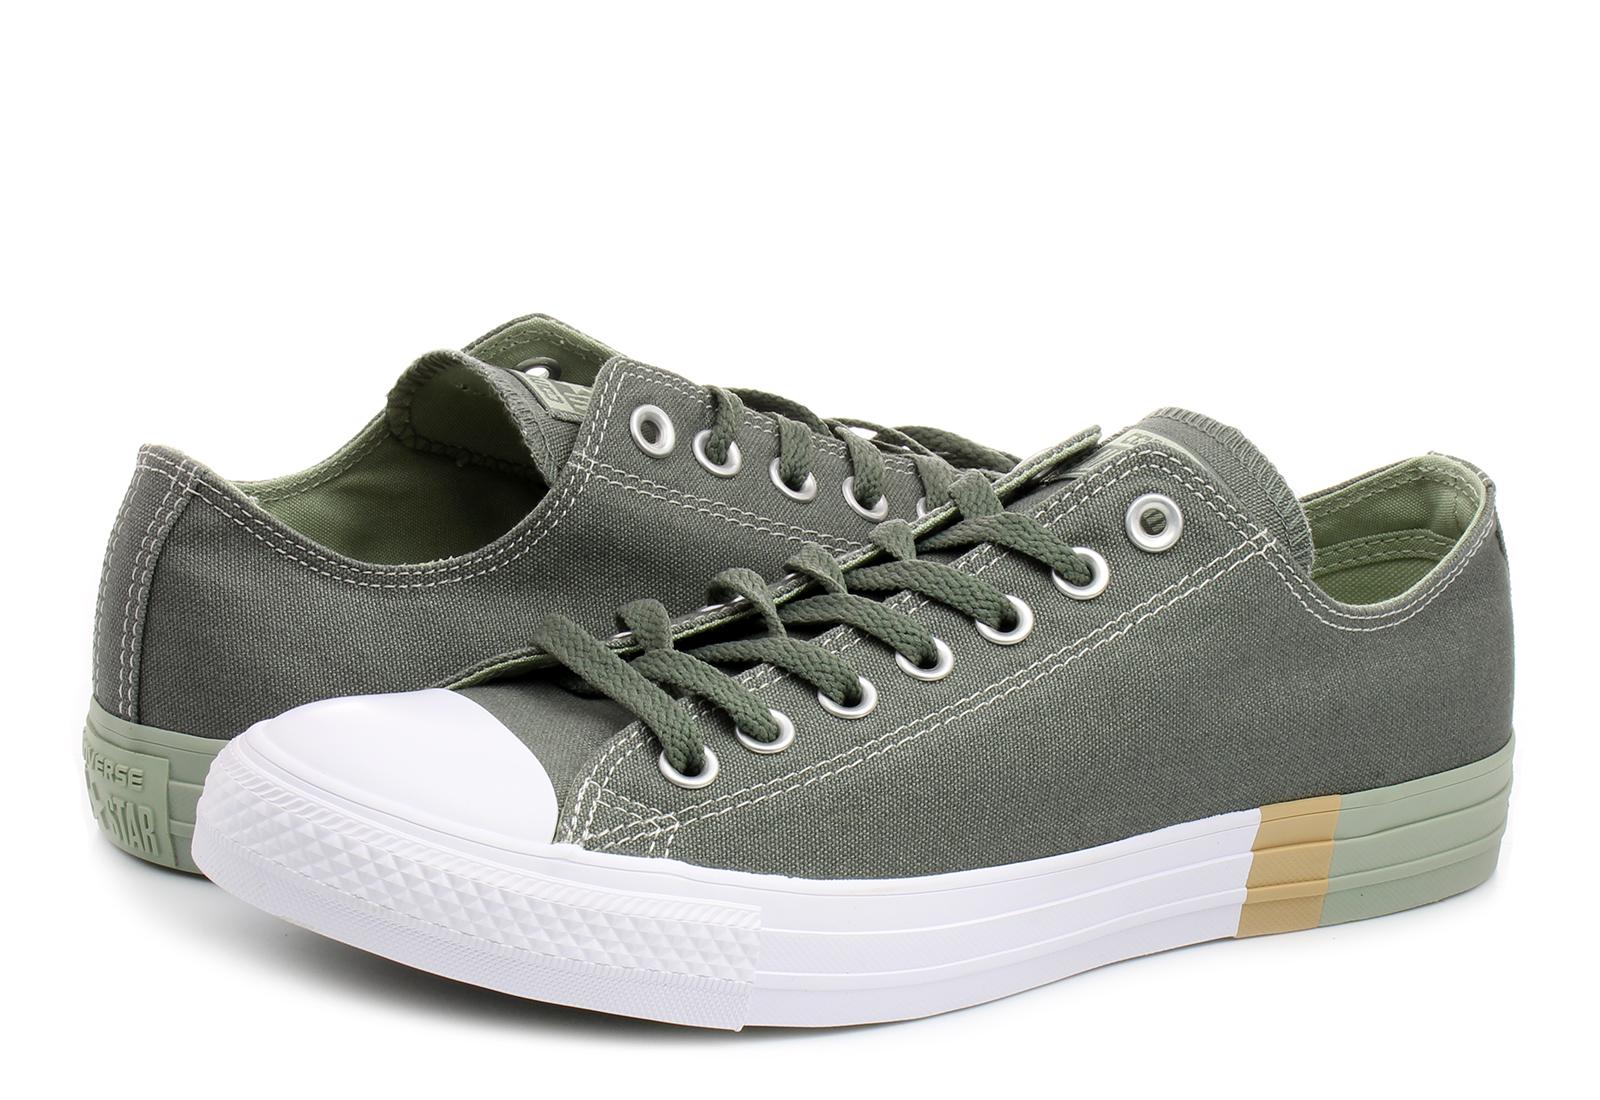 4b0ba3725e3d0 Converse, Vans, Tommy Hilfiger, Lacoste – Módní boty online